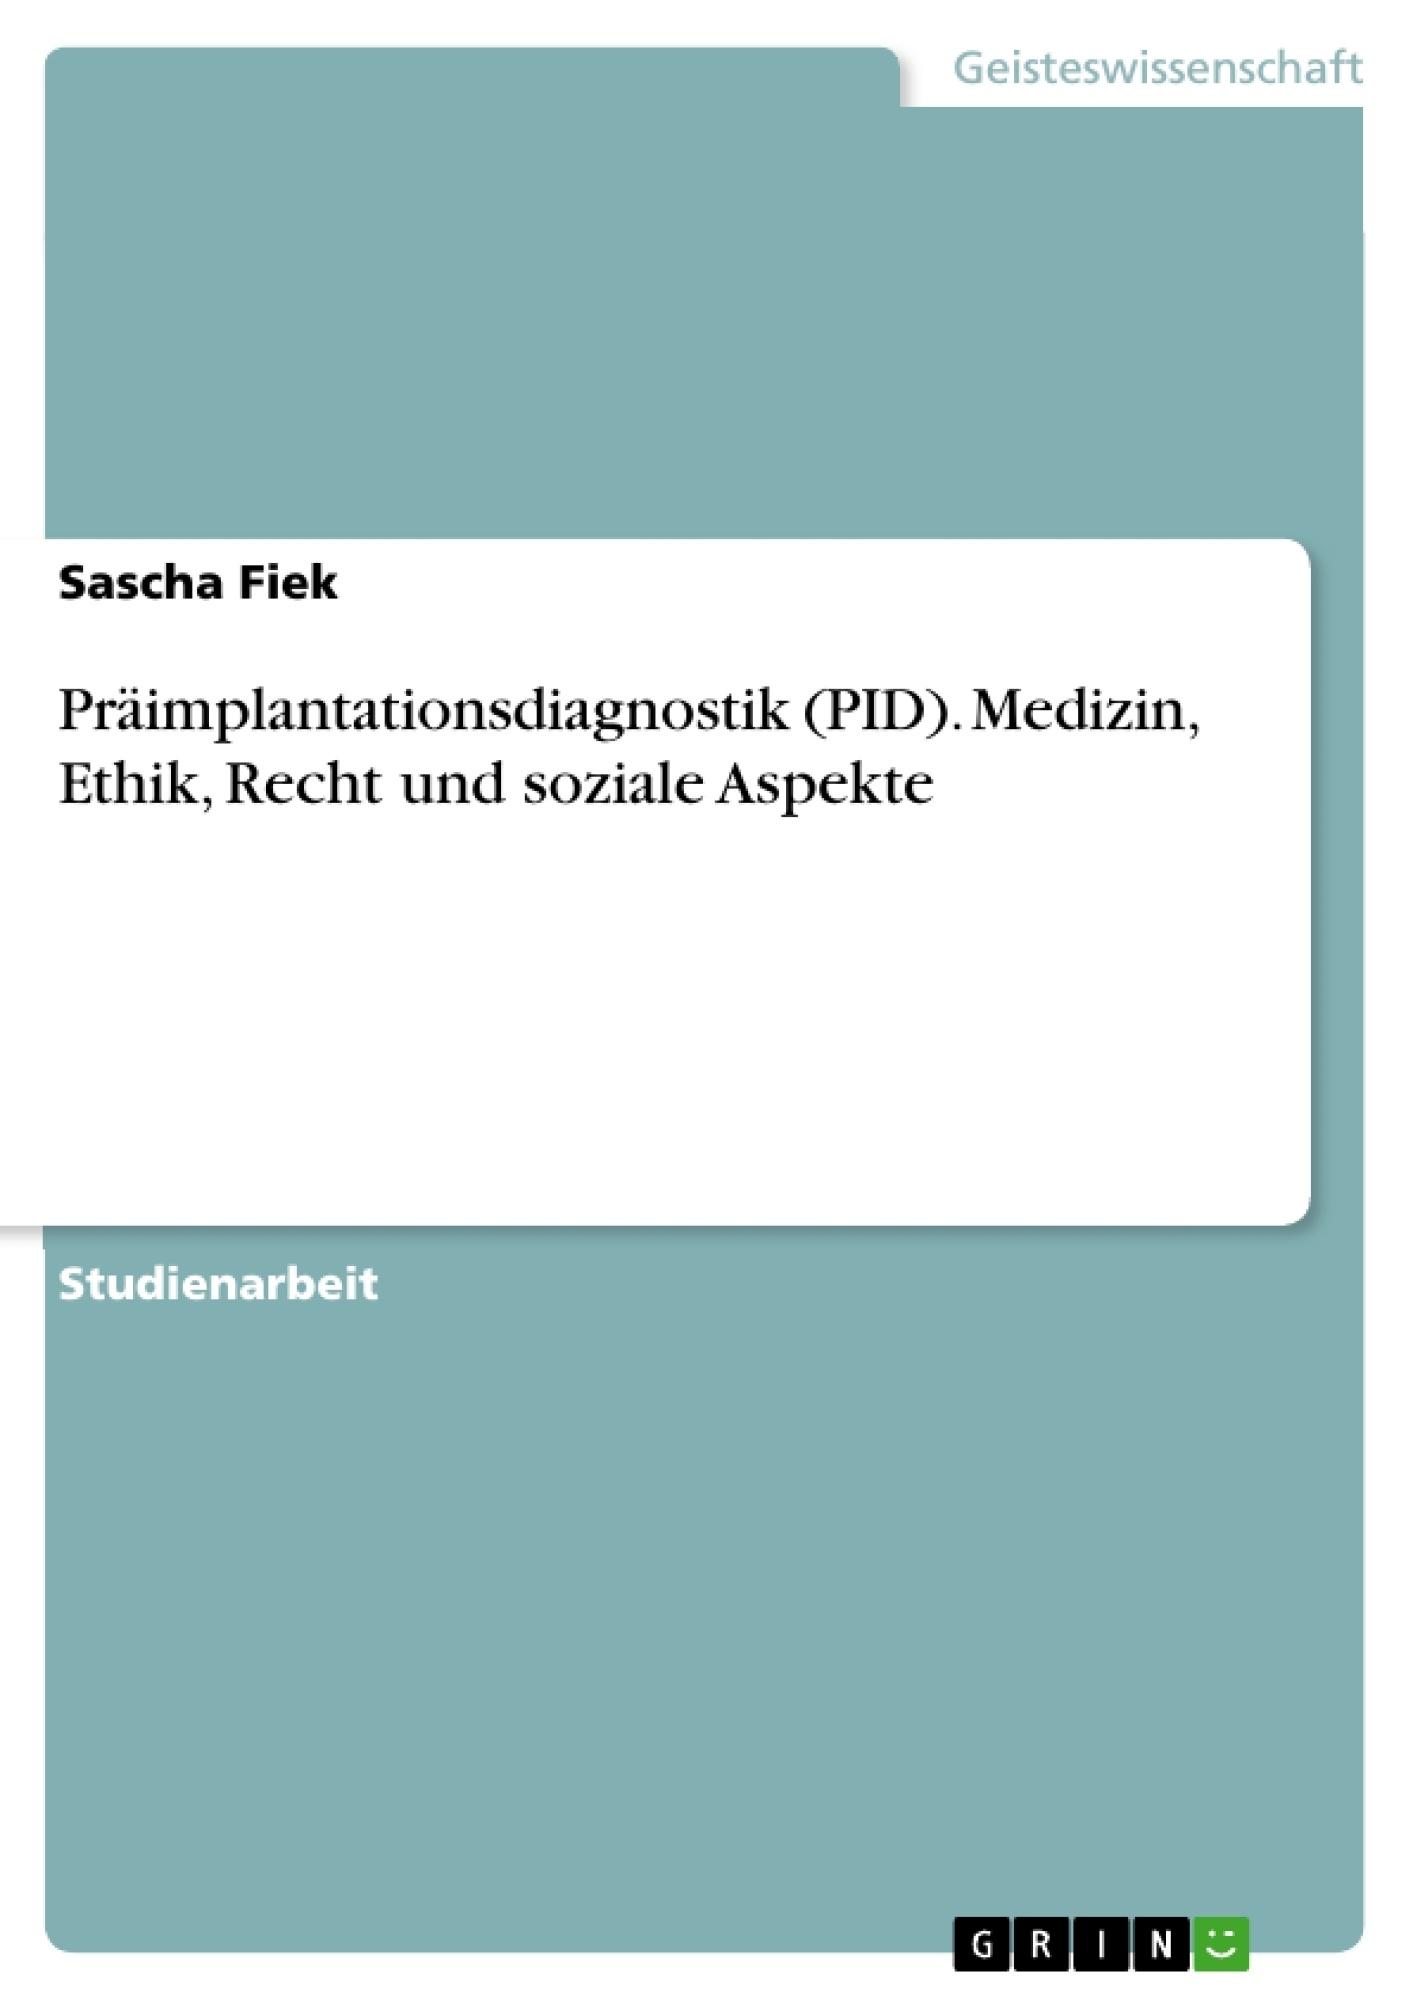 Titel: Präimplantationsdiagnostik (PID). Medizin, Ethik, Recht und soziale Aspekte